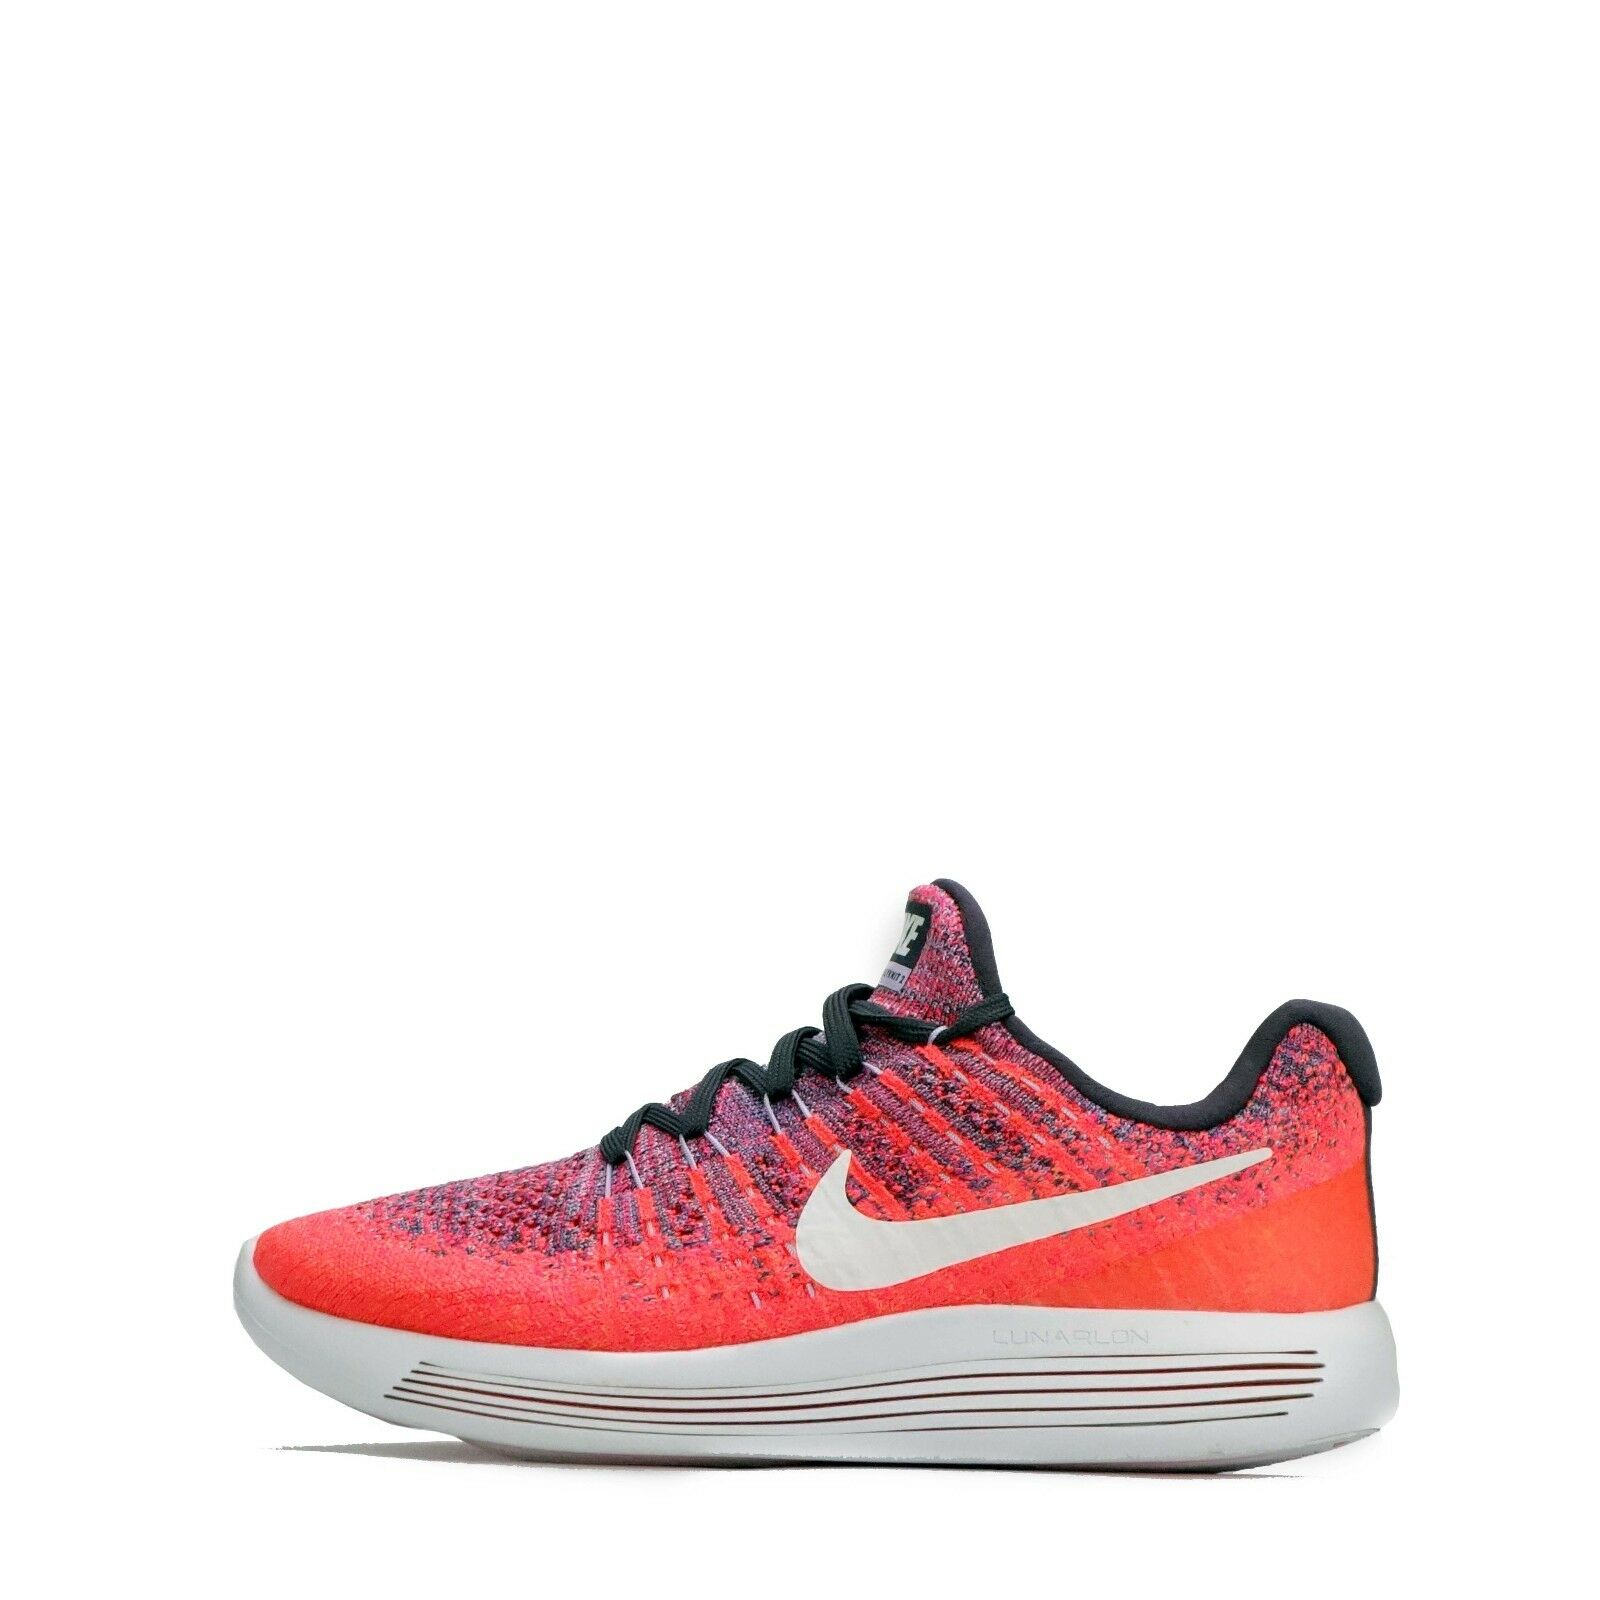 Nike lunarepic Bajo Flyknit 2 OSCURO Mujer Zapatillas Para Correr OSCURO 2 daa85f